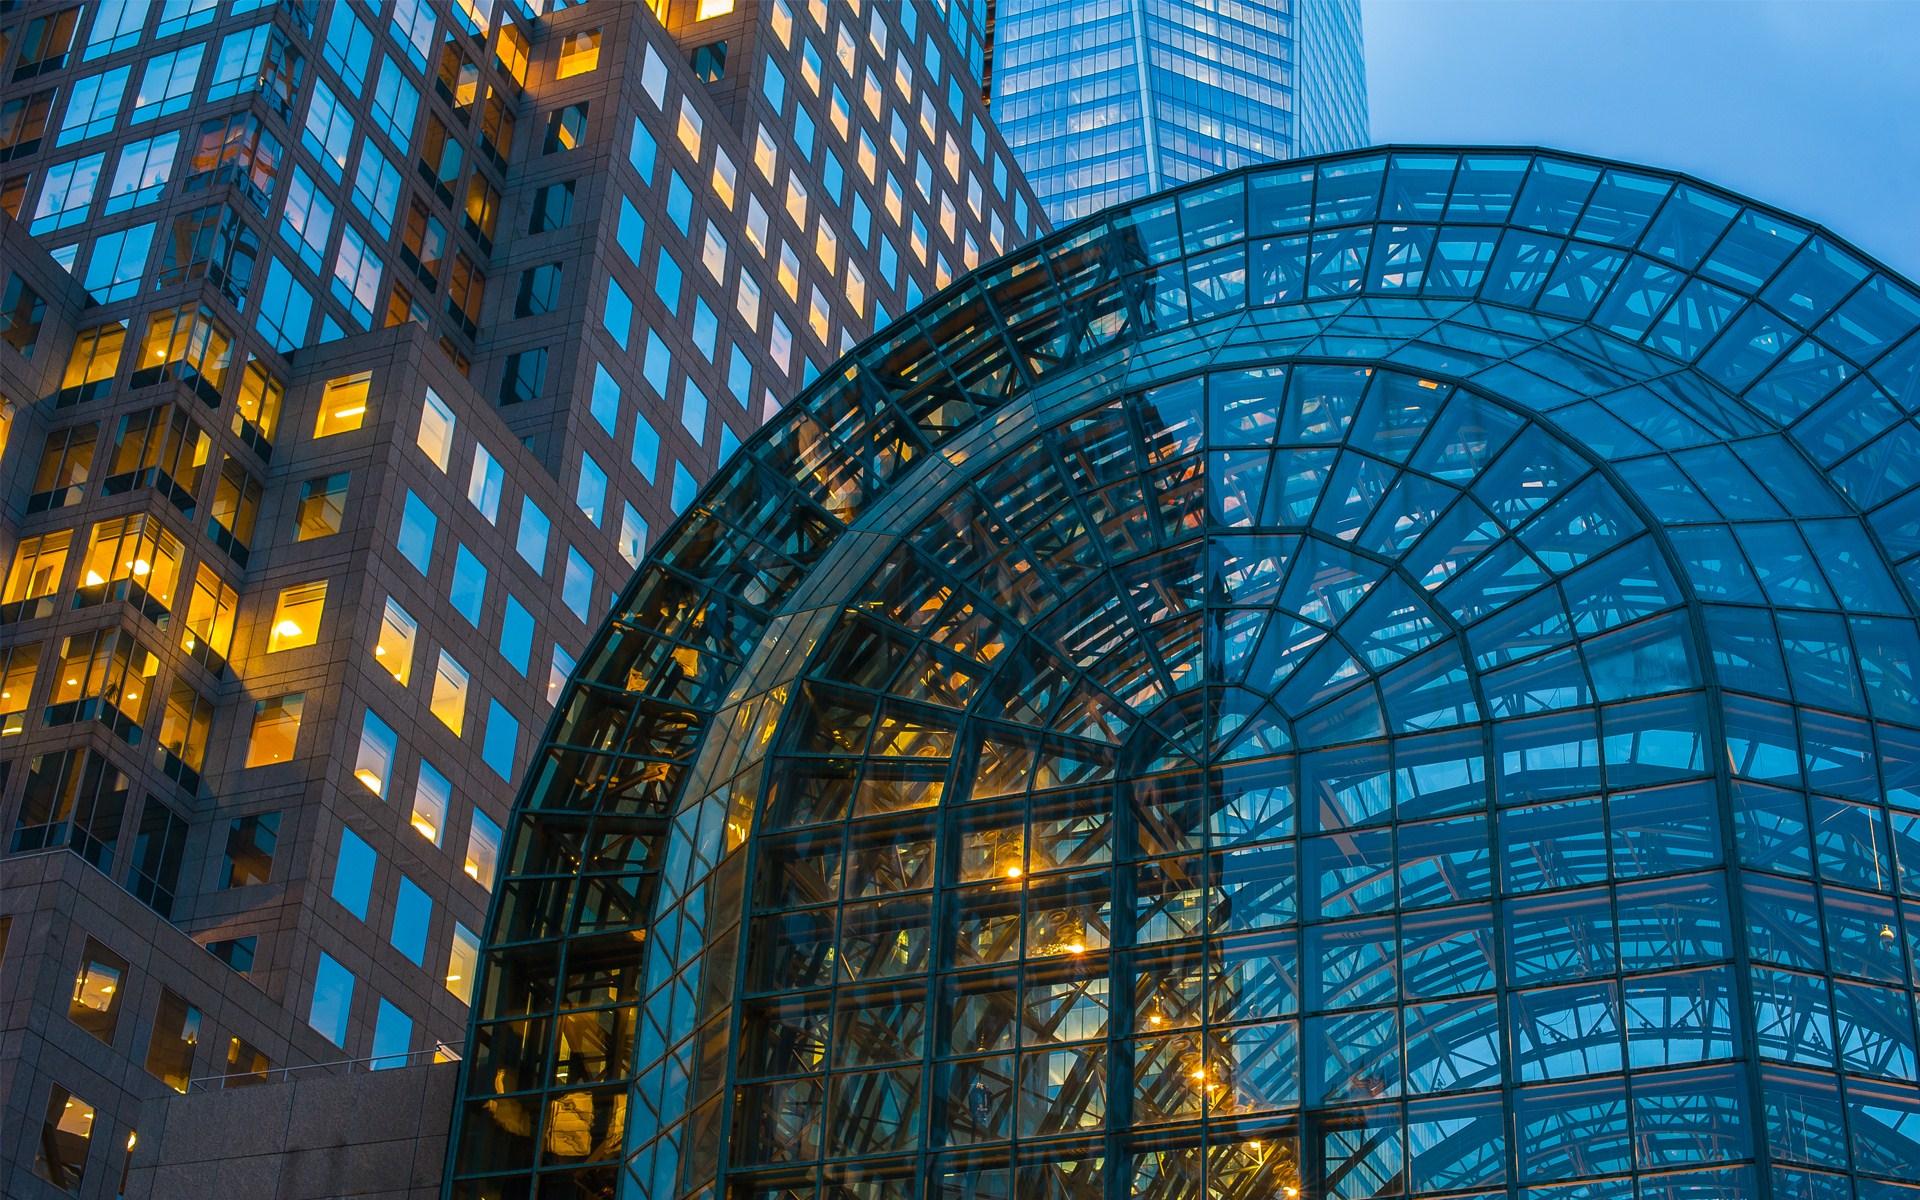 download glass buildings wallpaper - photo #24